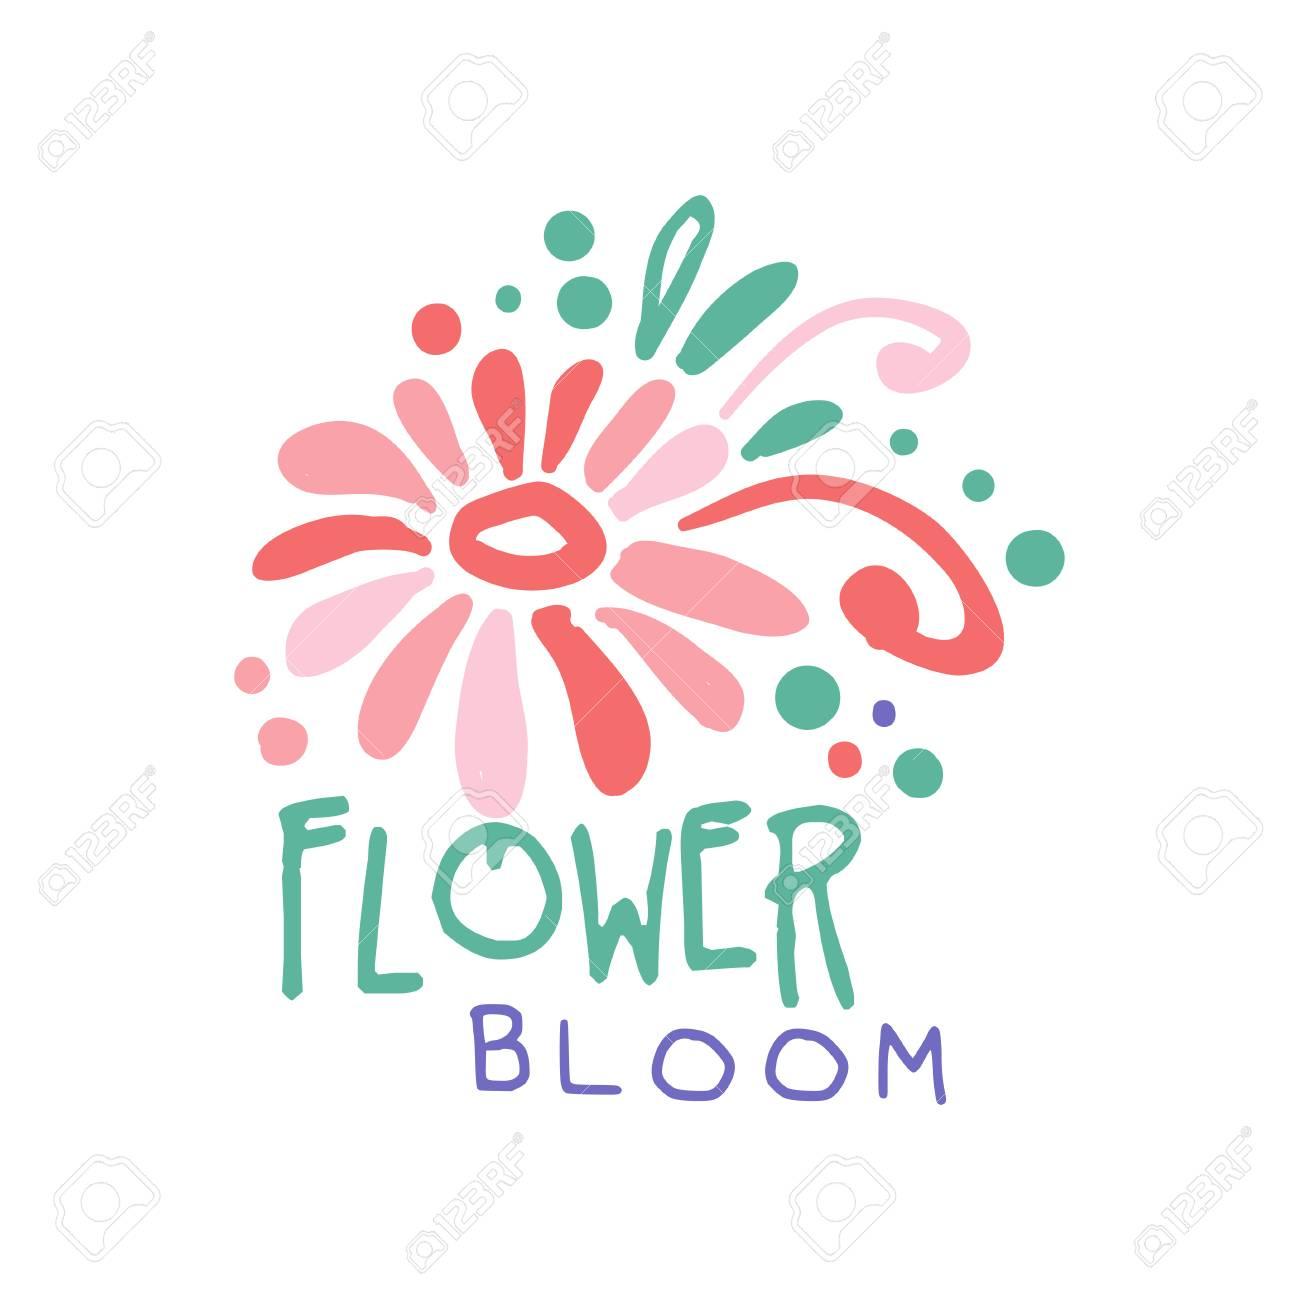 Flower bloom template, element for floral shop, boutique, flyer,